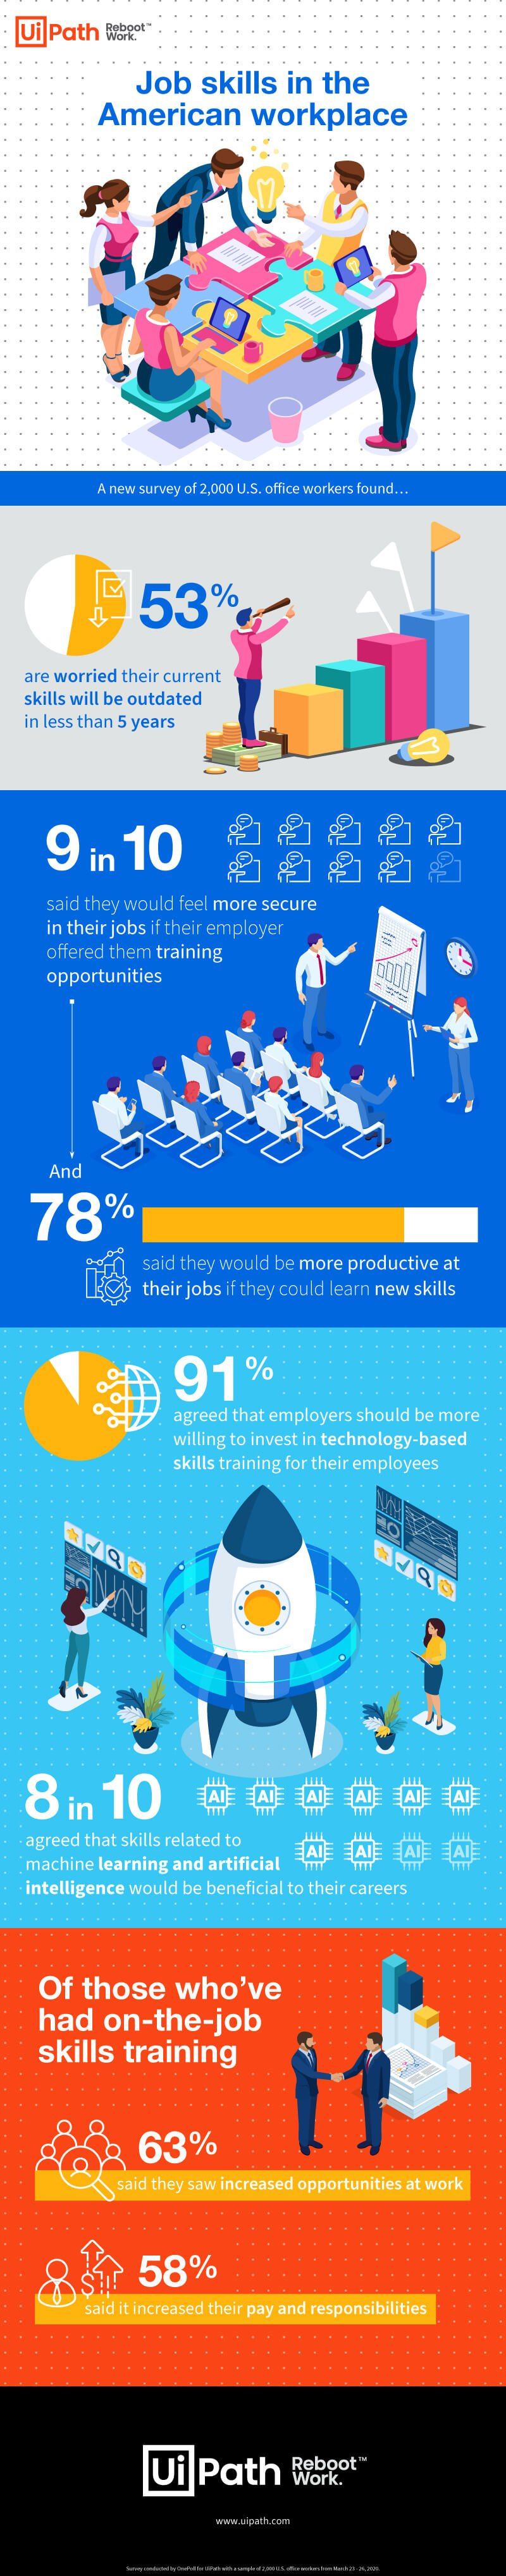 uipath workforce survey skills gap may 2020